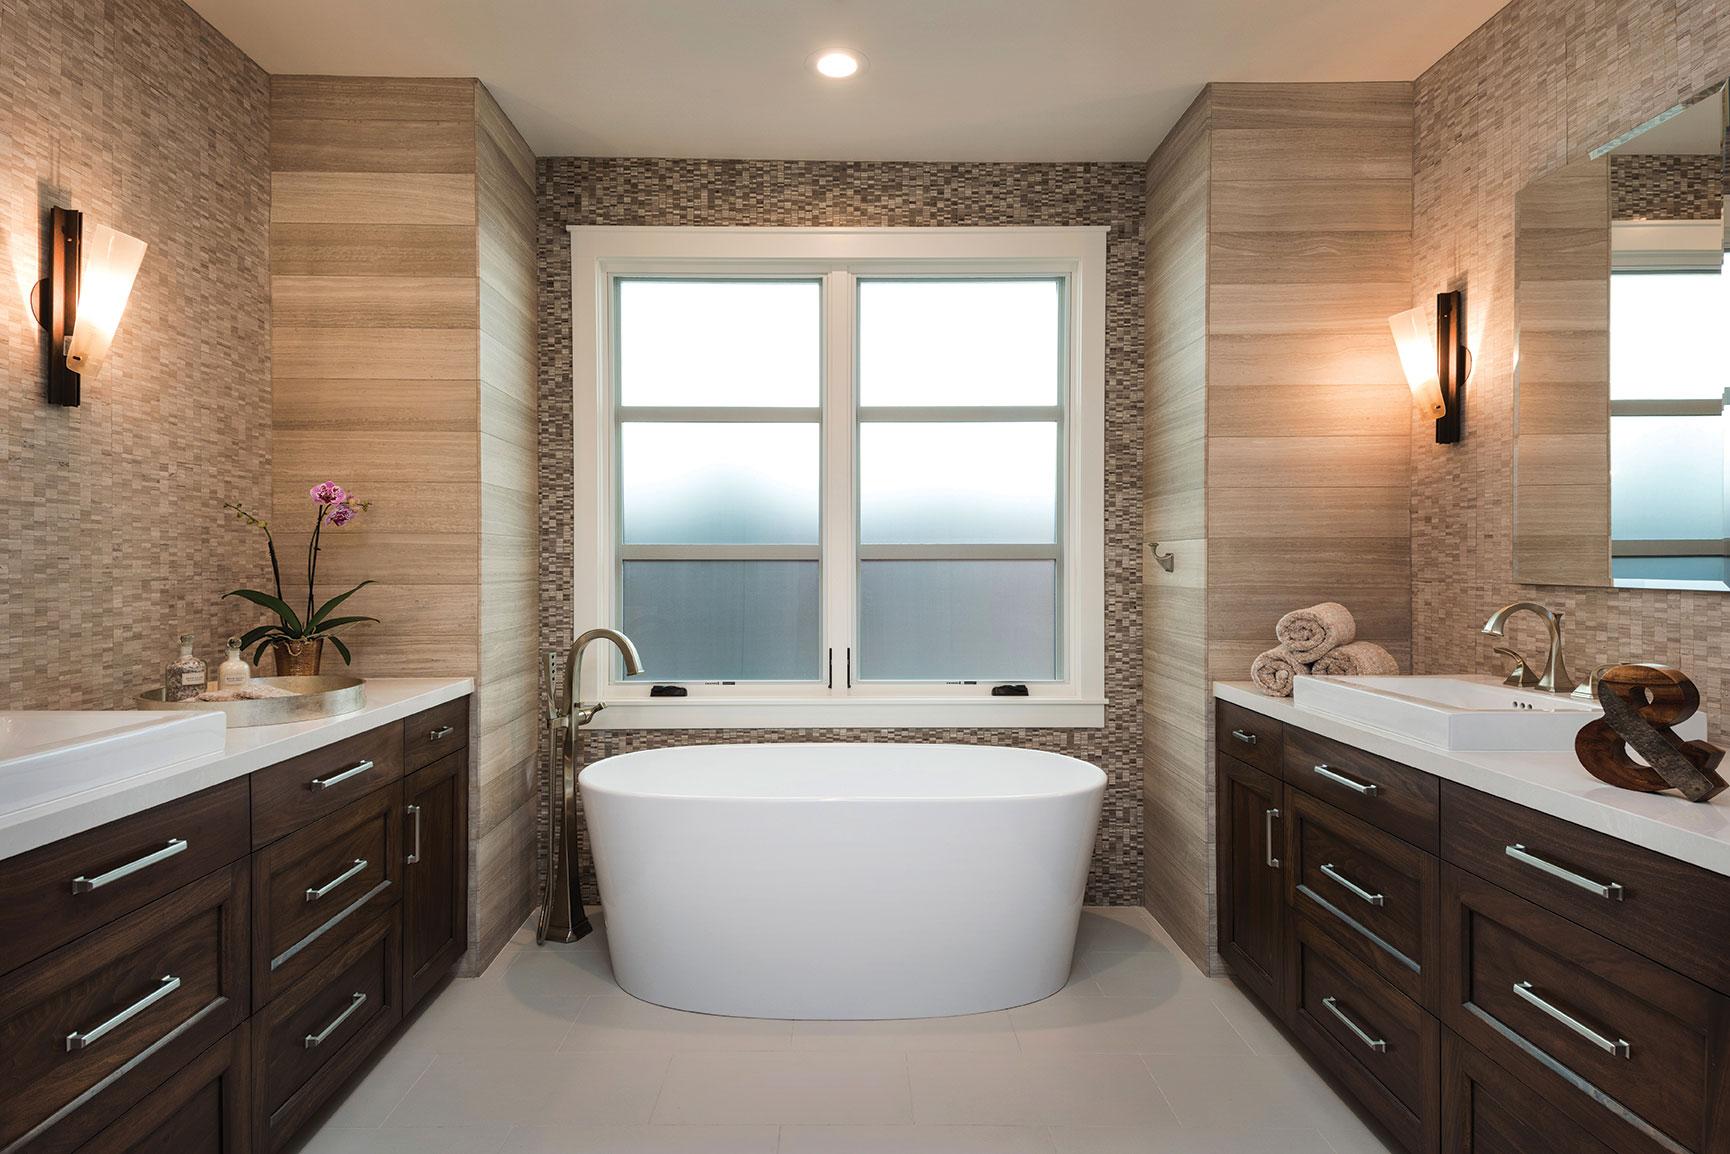 stand-alone sculptural tub bathroom in la jolla coastal kid-friendly remodel